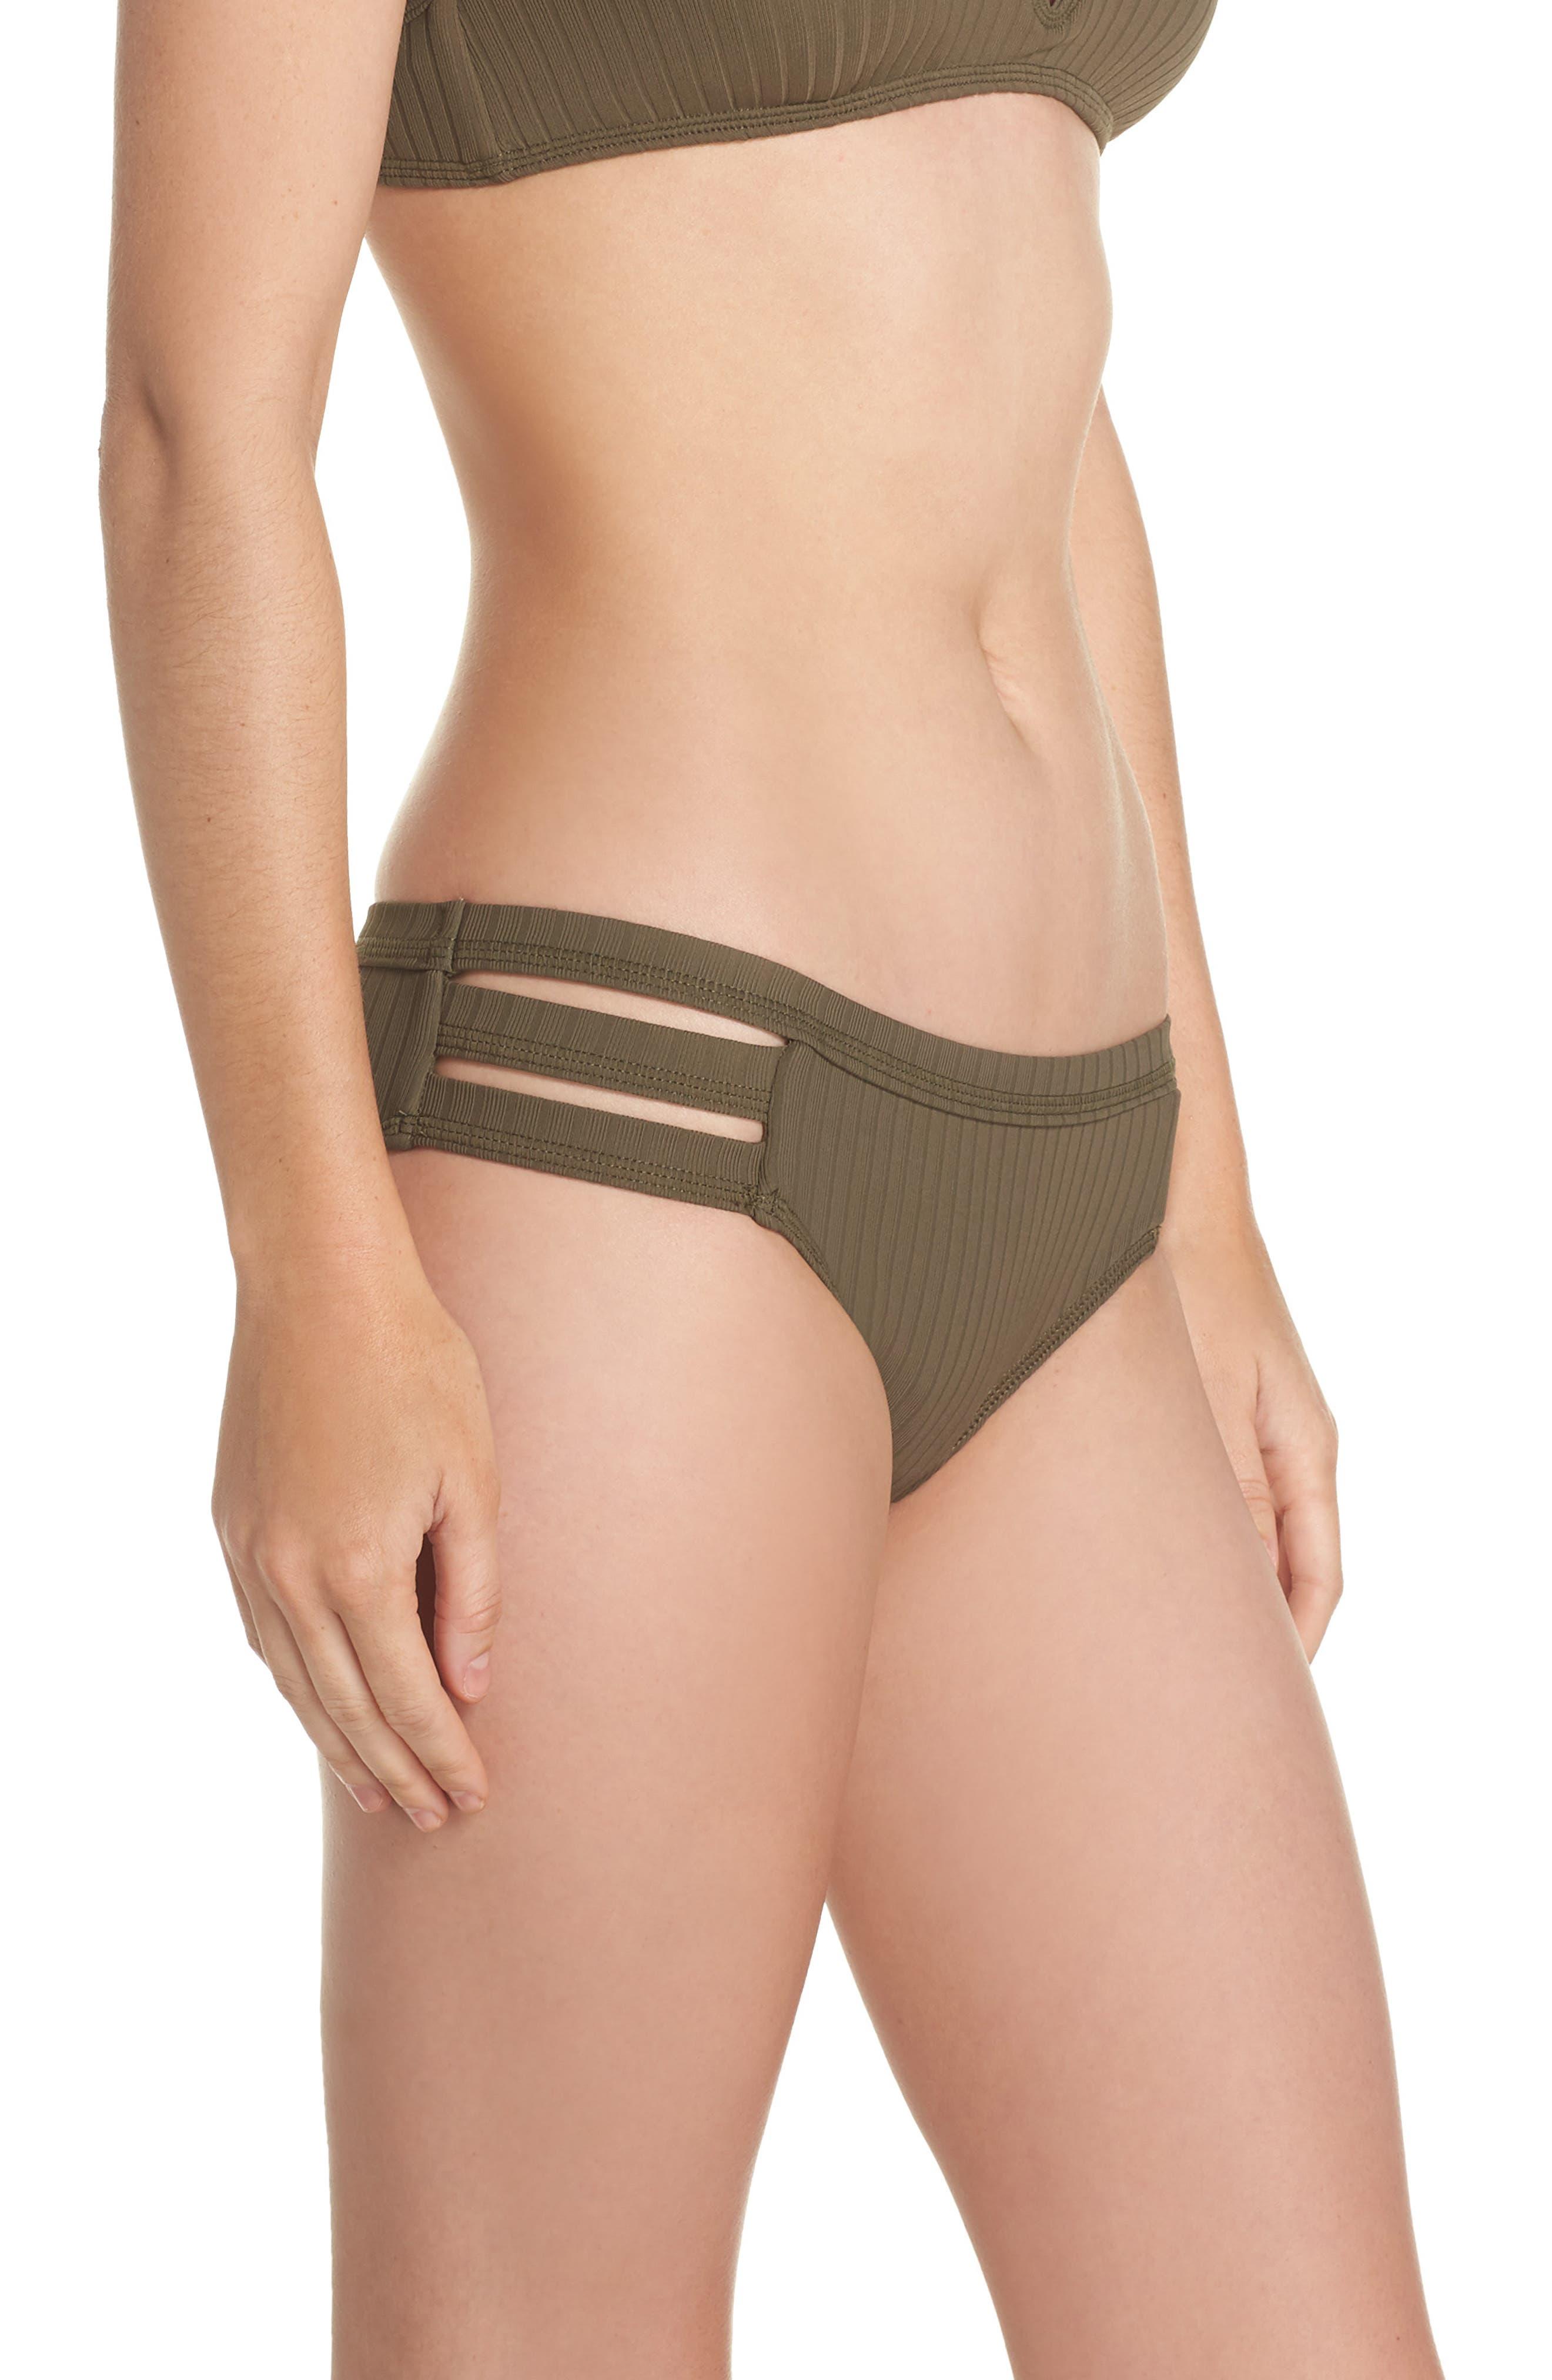 Inka Ribbed Hipster Bikini Bottoms,                             Alternate thumbnail 3, color,                             Dark Olive